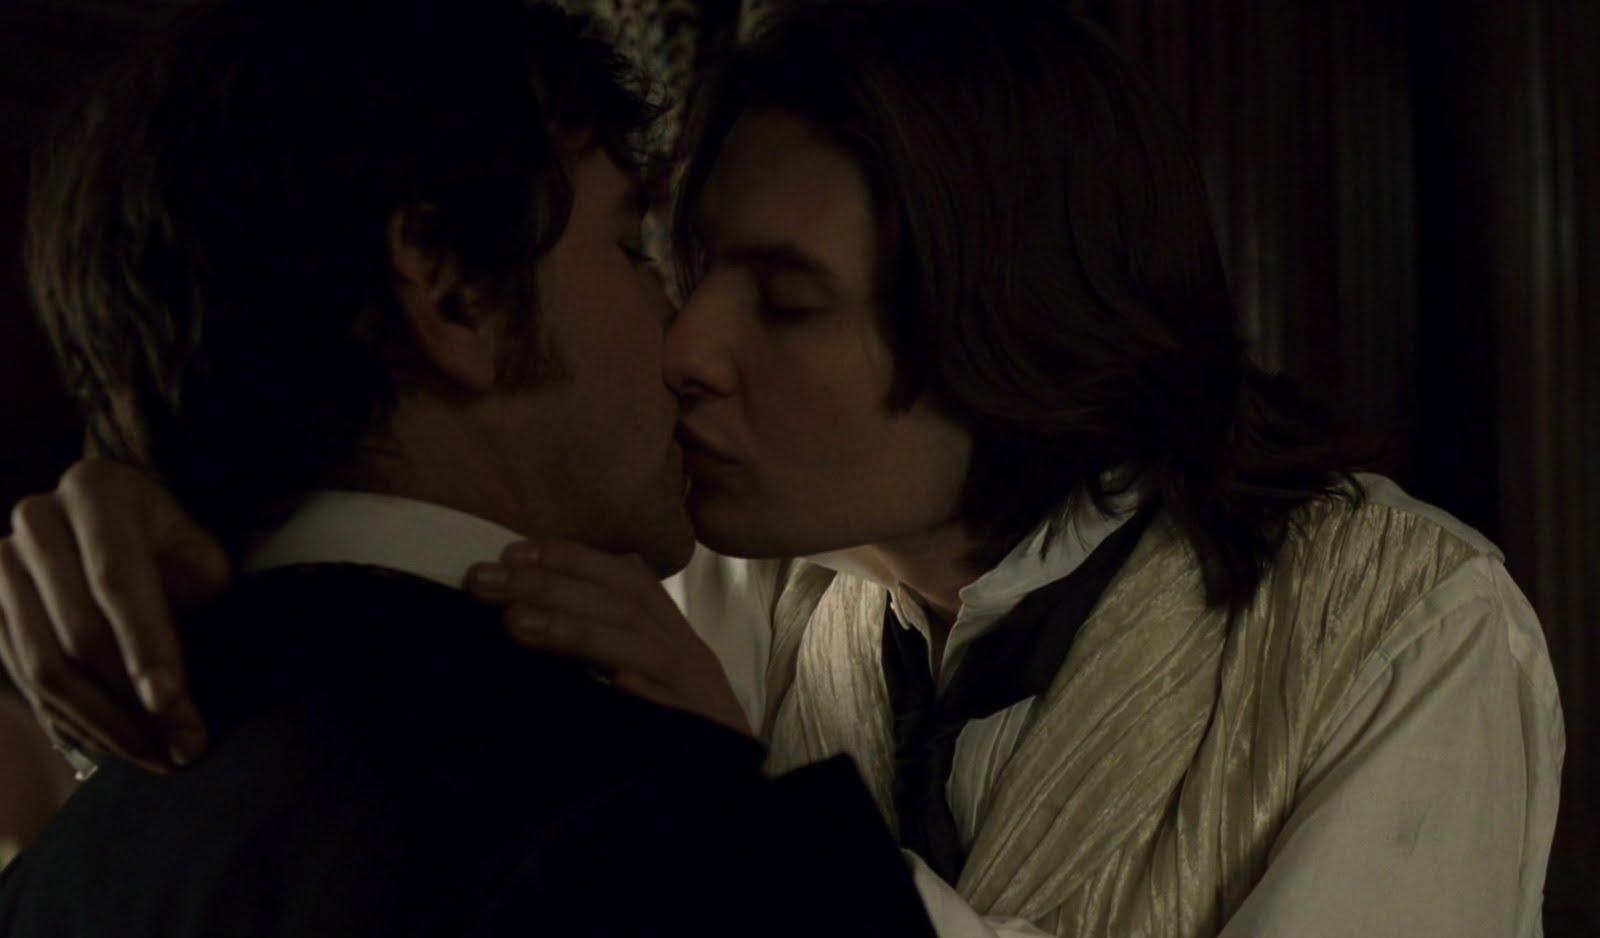 http://3.bp.blogspot.com/_Ne5Lb2SiFHg/S8YZ8STNIWI/AAAAAAAAvJM/w0804U2tmeI/s1600/barnes+dorian+5+kiss+chaplin.jpg